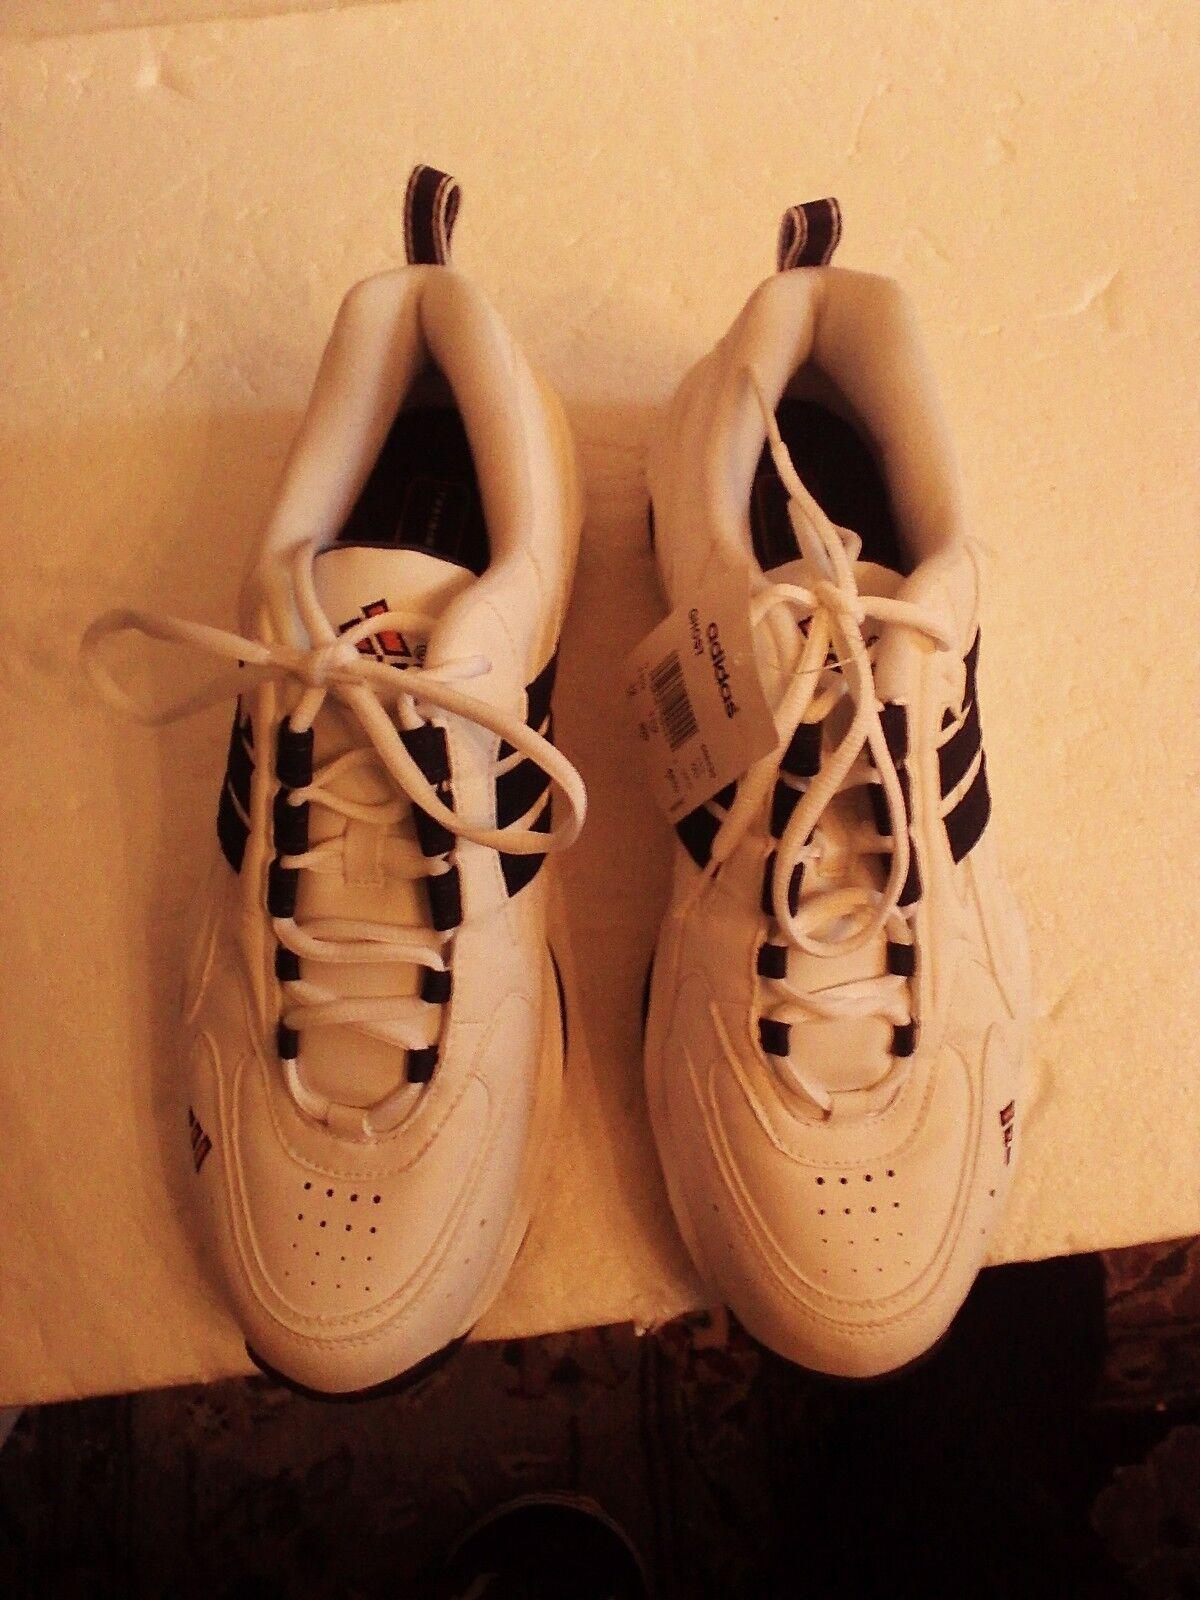 adidas schuhe training mens adiprene cross - training schuhe weiß / schwarz beschnittgröße 12 m f96ed0